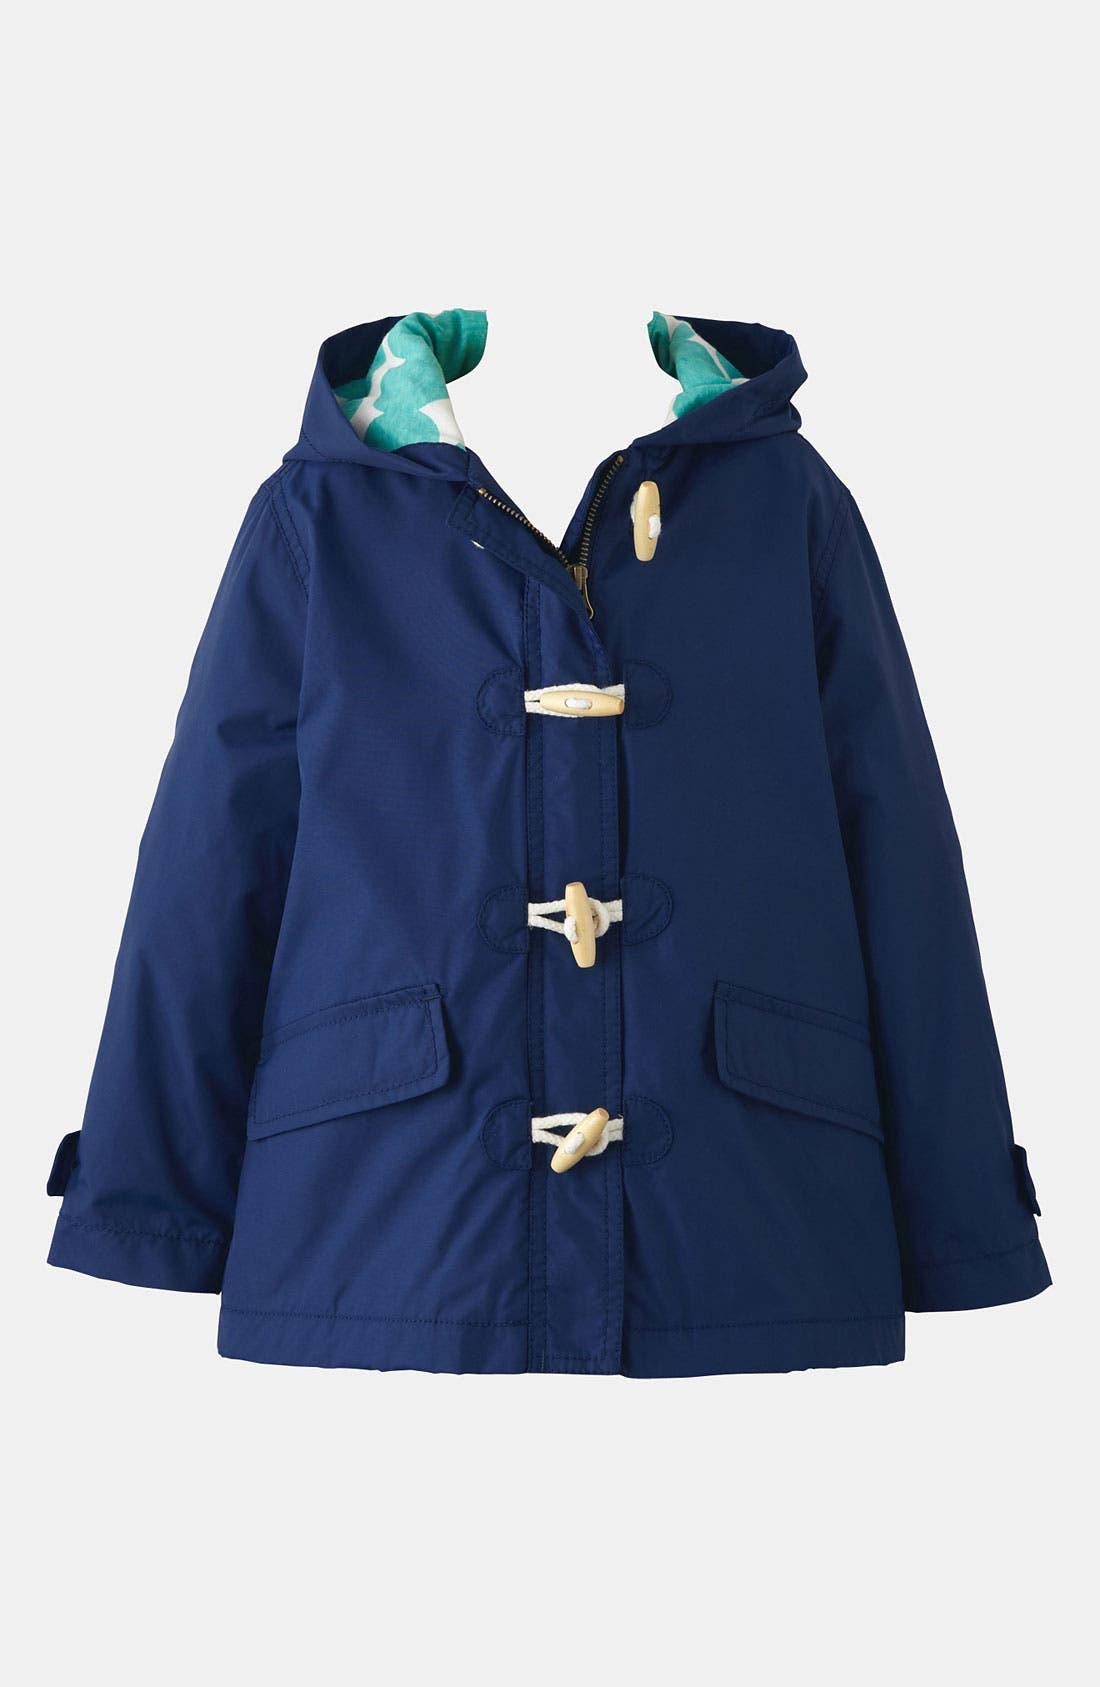 Alternate Image 1 Selected - Mini Boden 'Fisherman' Rain Jacket (Little Girls & Big Girls)